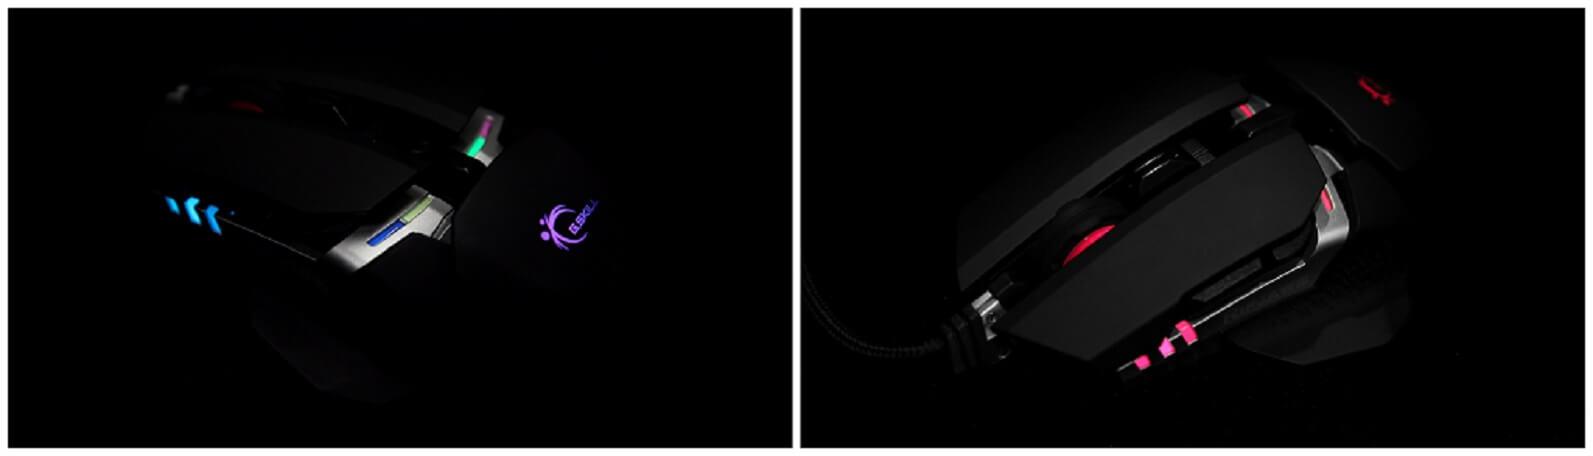 G.SKILL MX780 Lighting